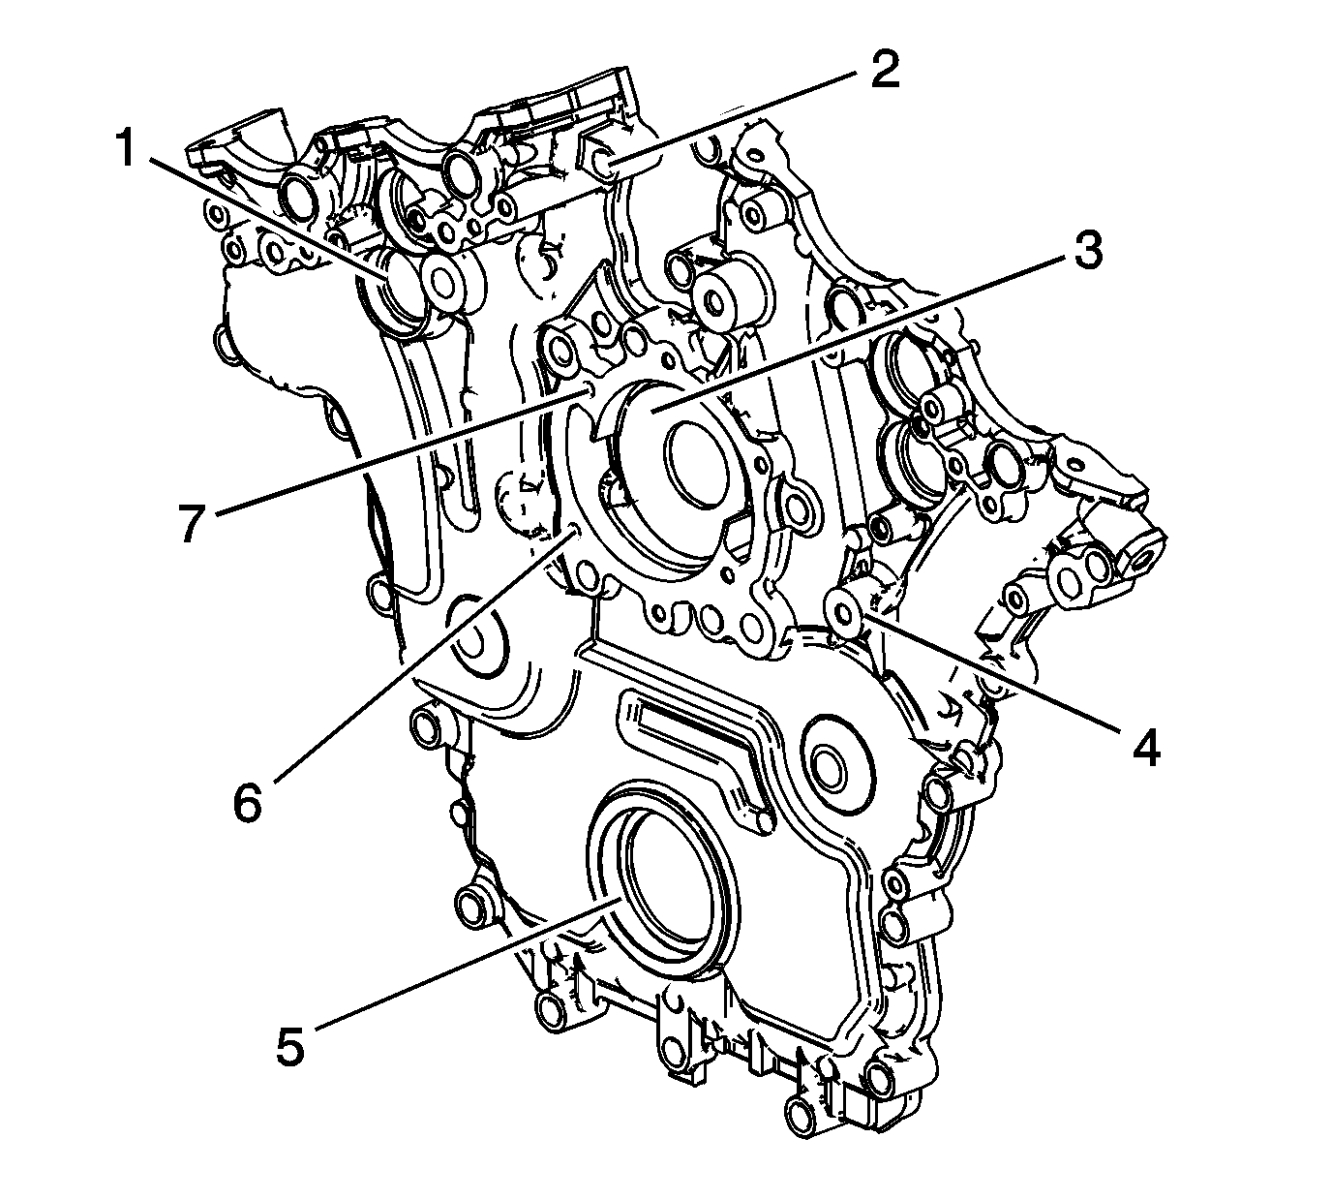 Repairing Engine Front Cover Oil Leak Gm